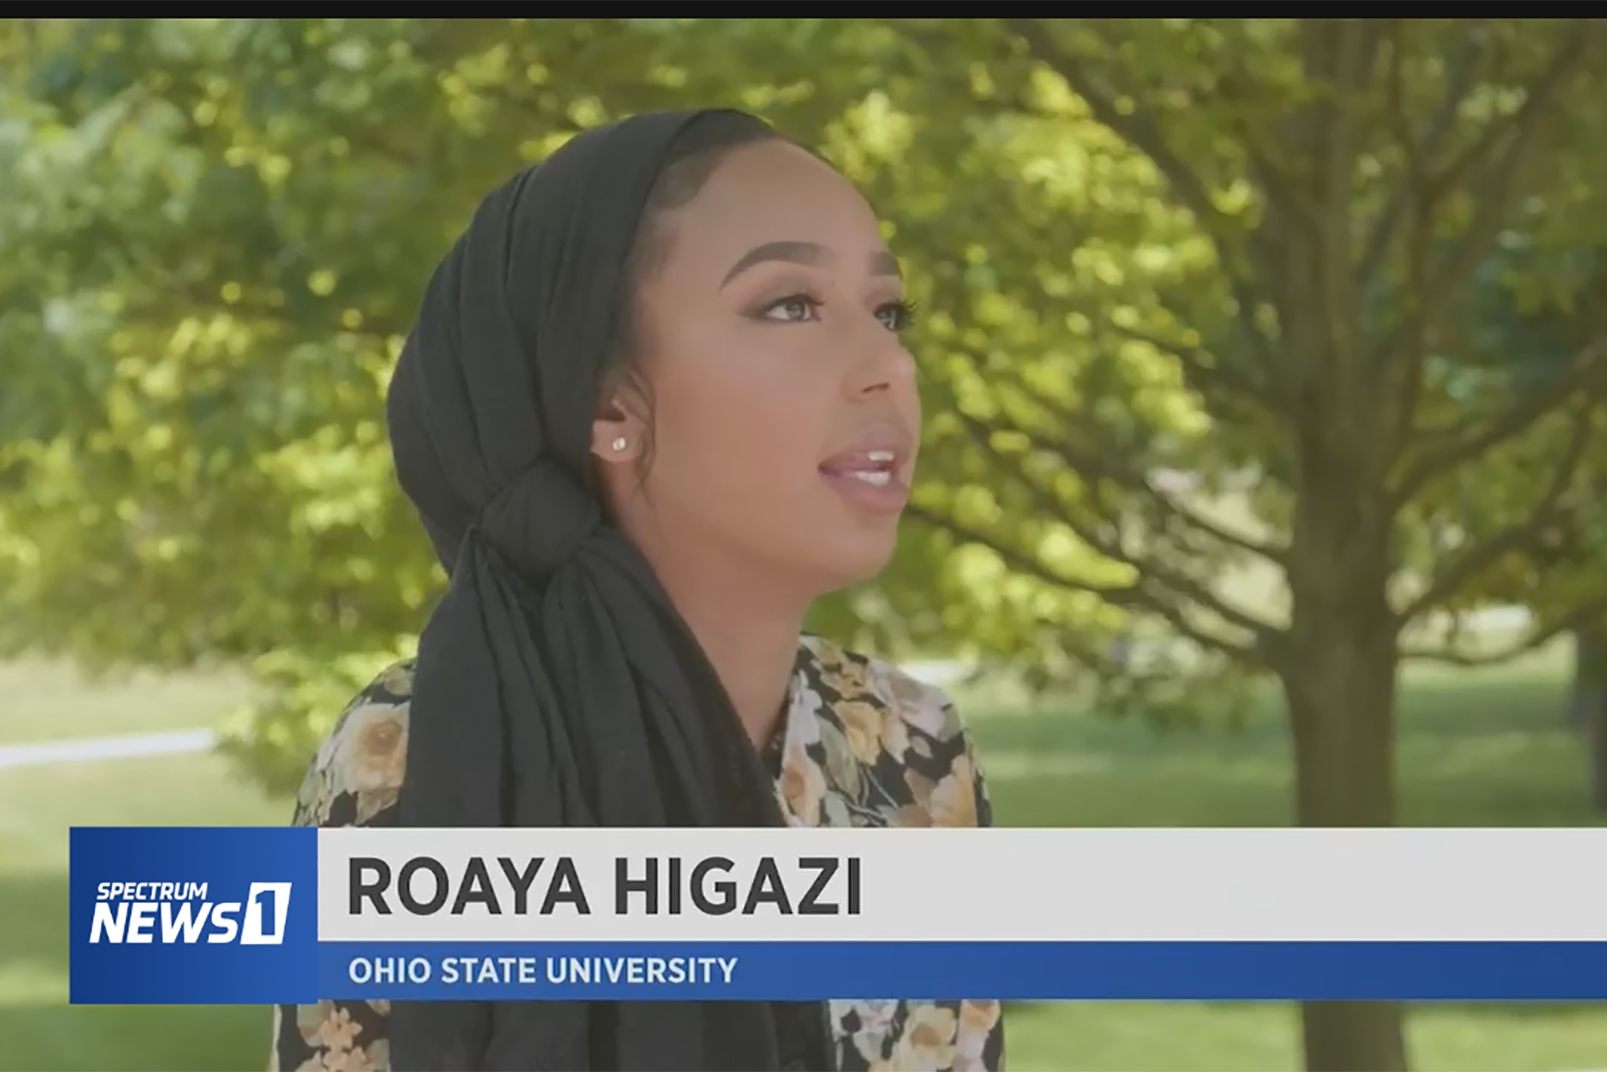 Speaker: Roaya Higazi